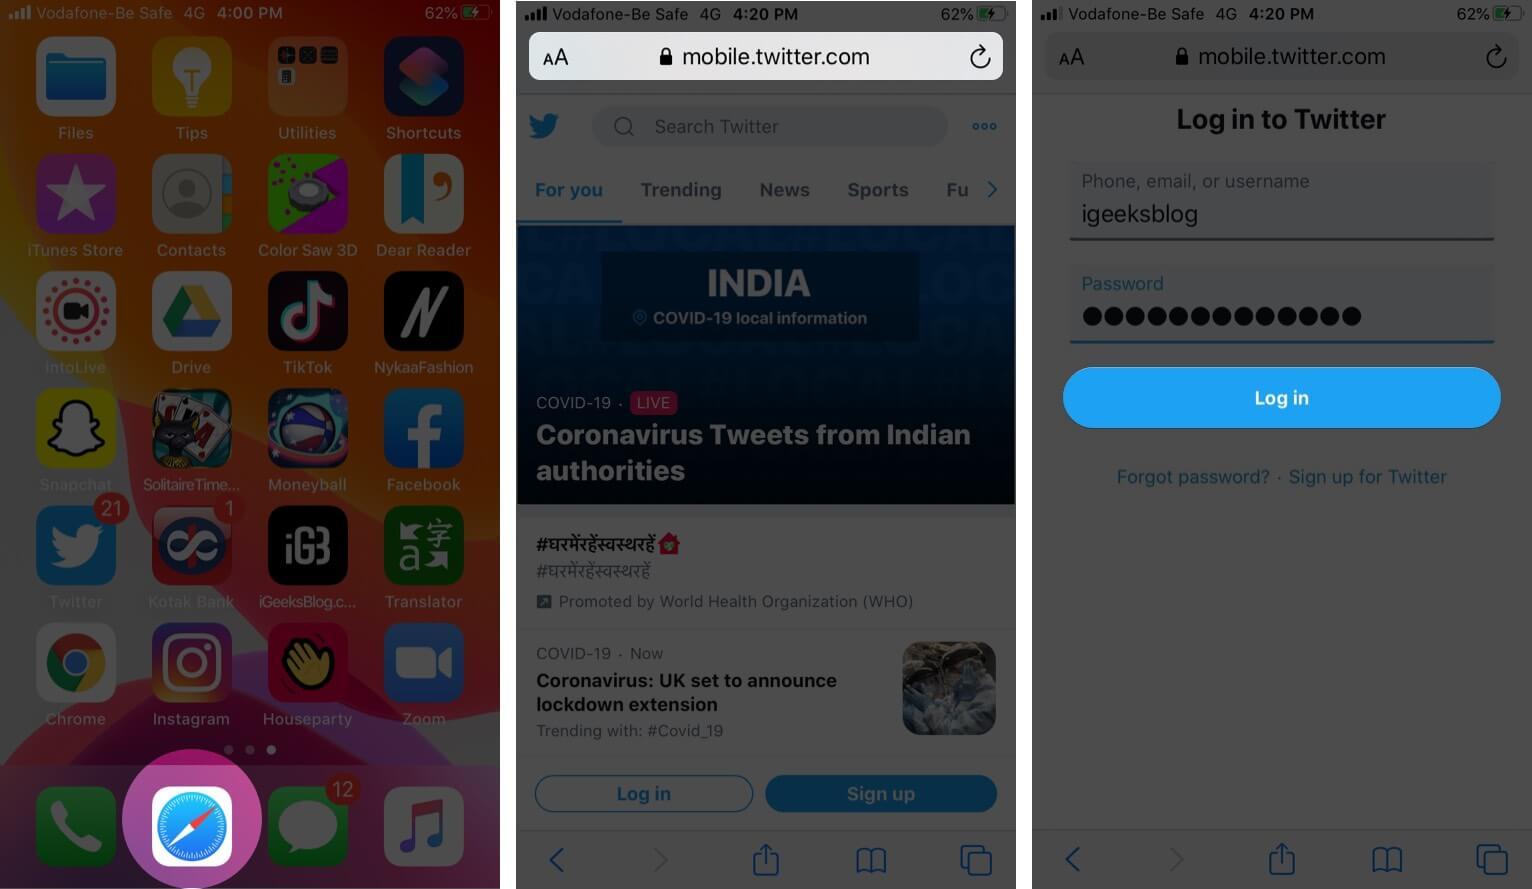 Log in to Twitter Account in Safari on iPhone